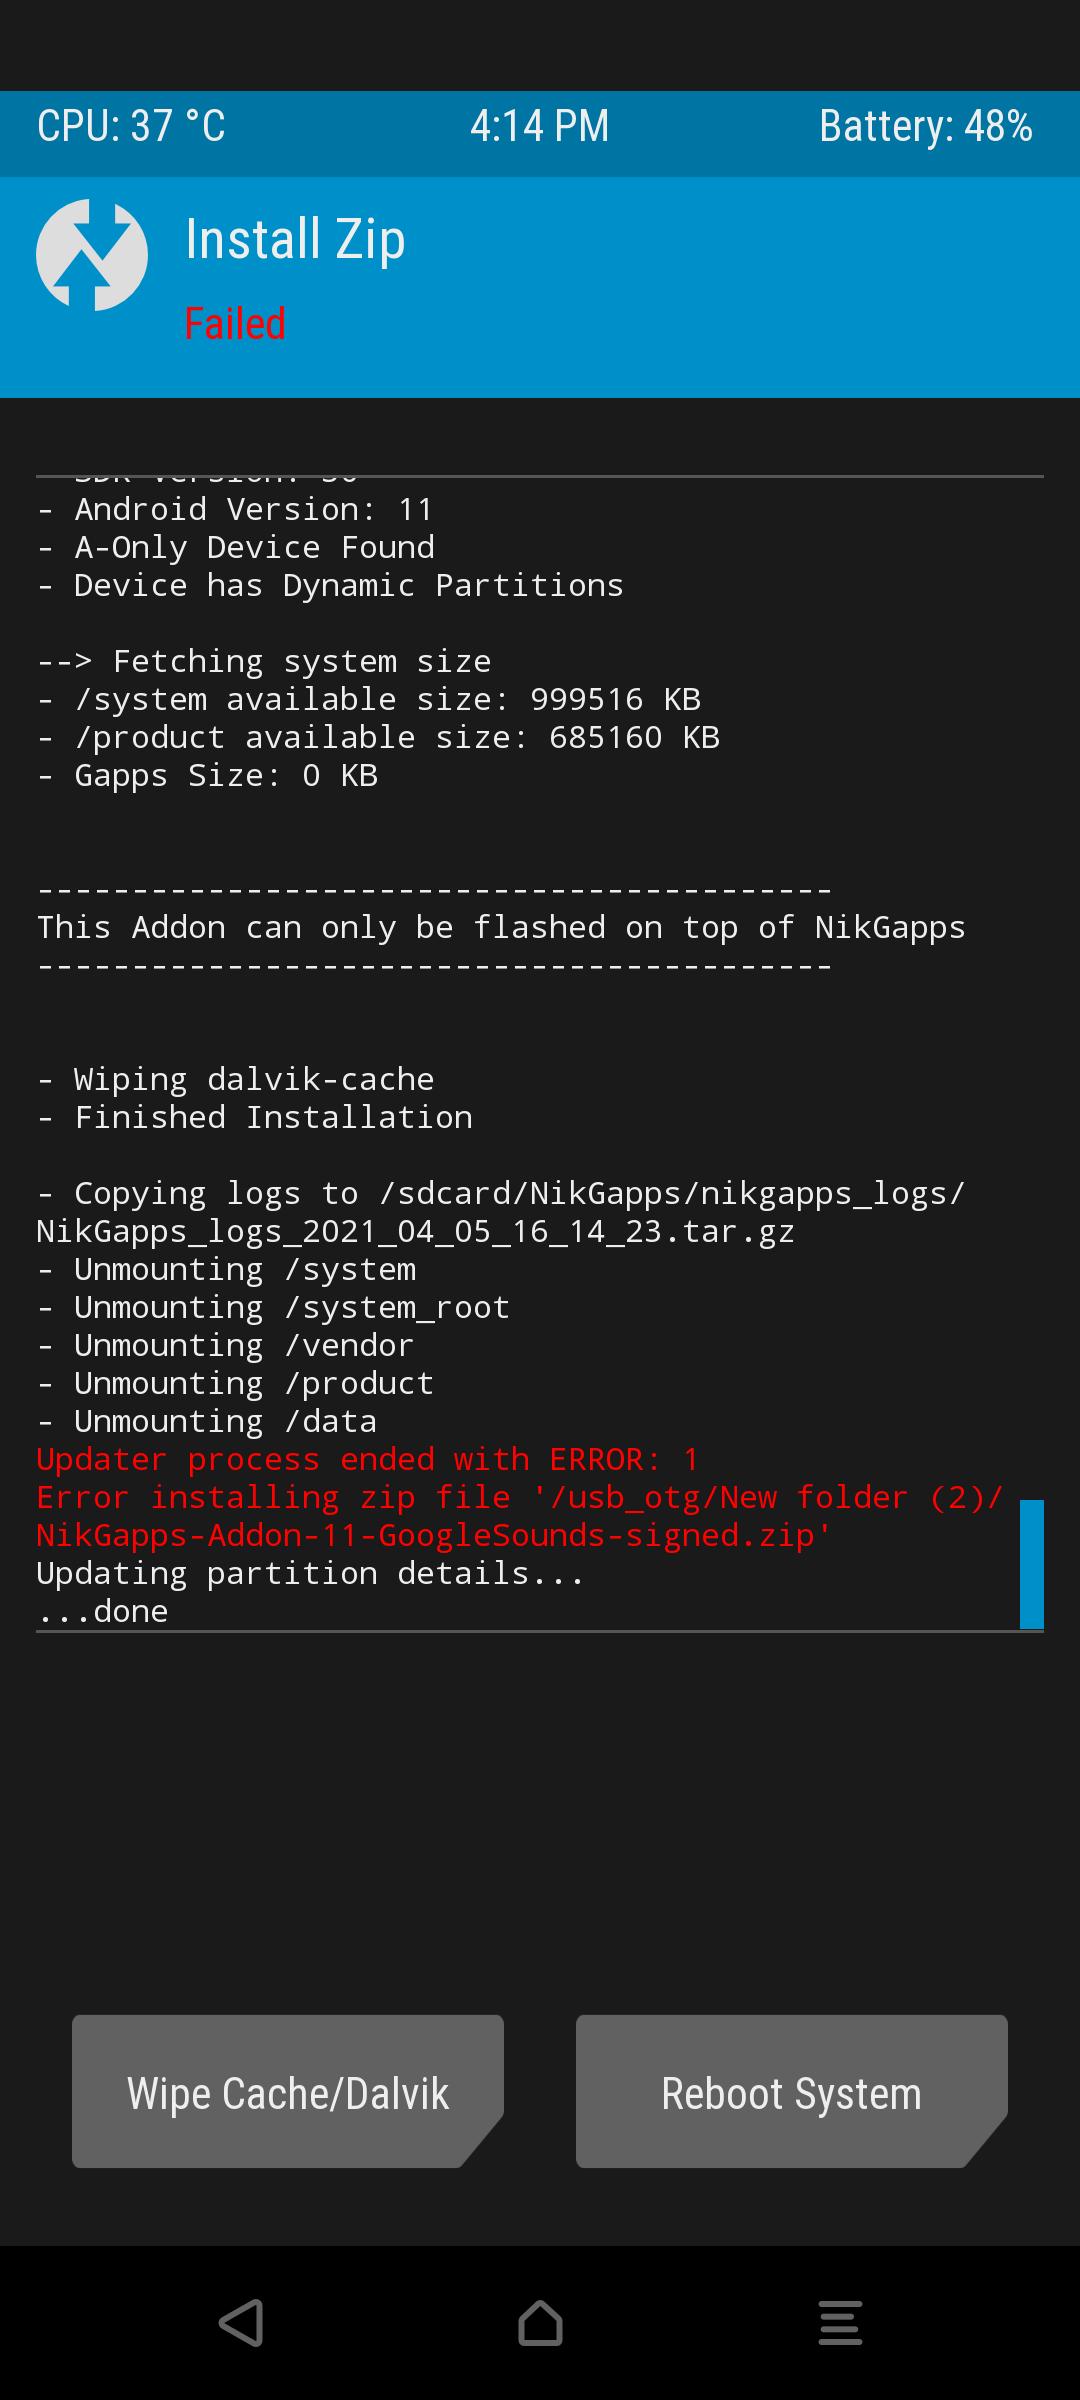 Screenshot_2021-04-05-16-14-45.png